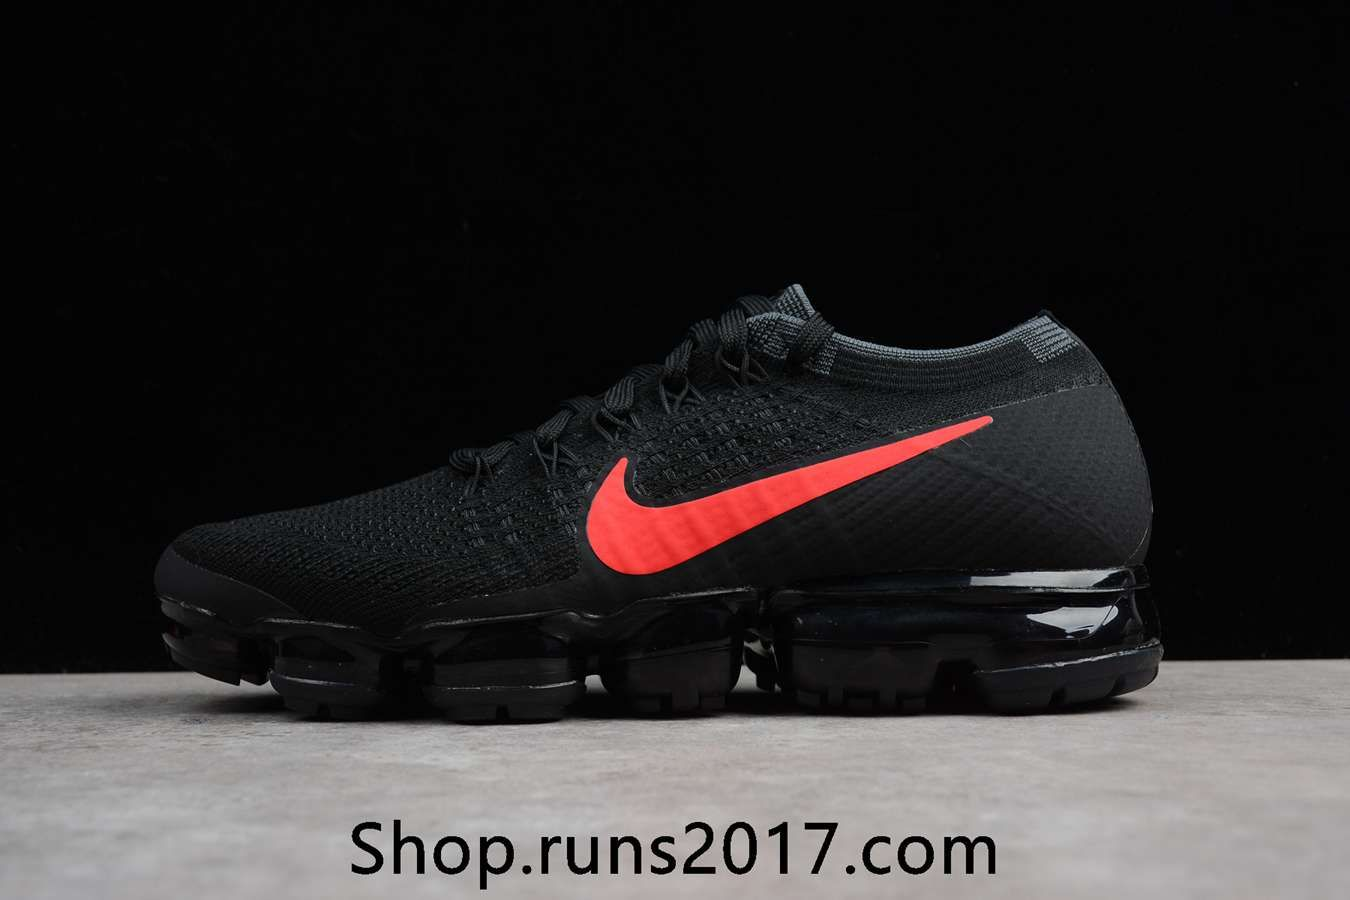 New Nike Air VaporMax 2018 Flyknit Black Red Tick Women Men